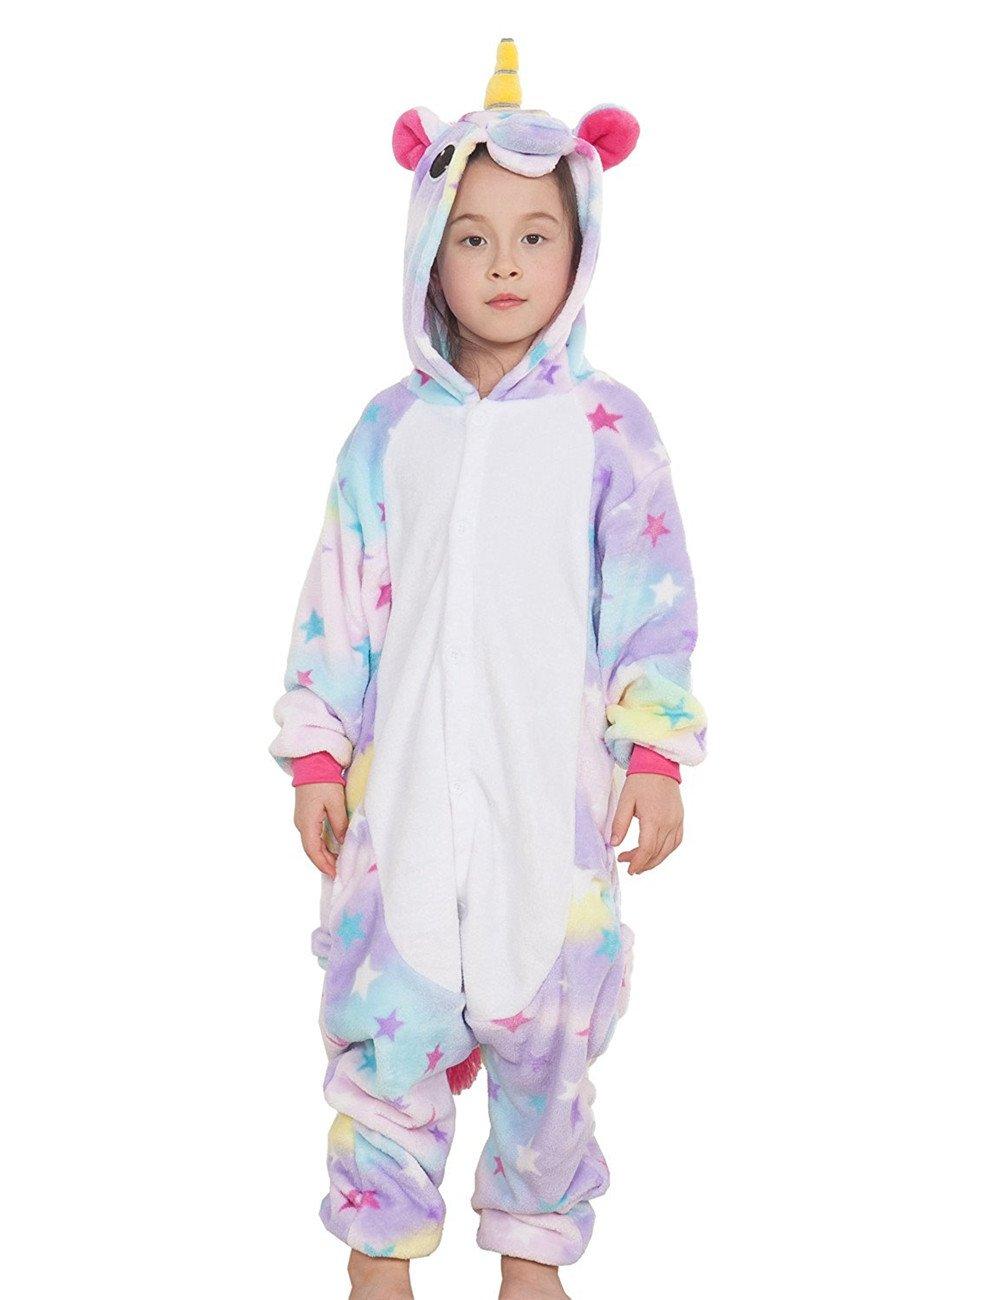 Bambini Unisex Unicorno Animali Pigiama Partywear Sleepwear Costumi Cosplay